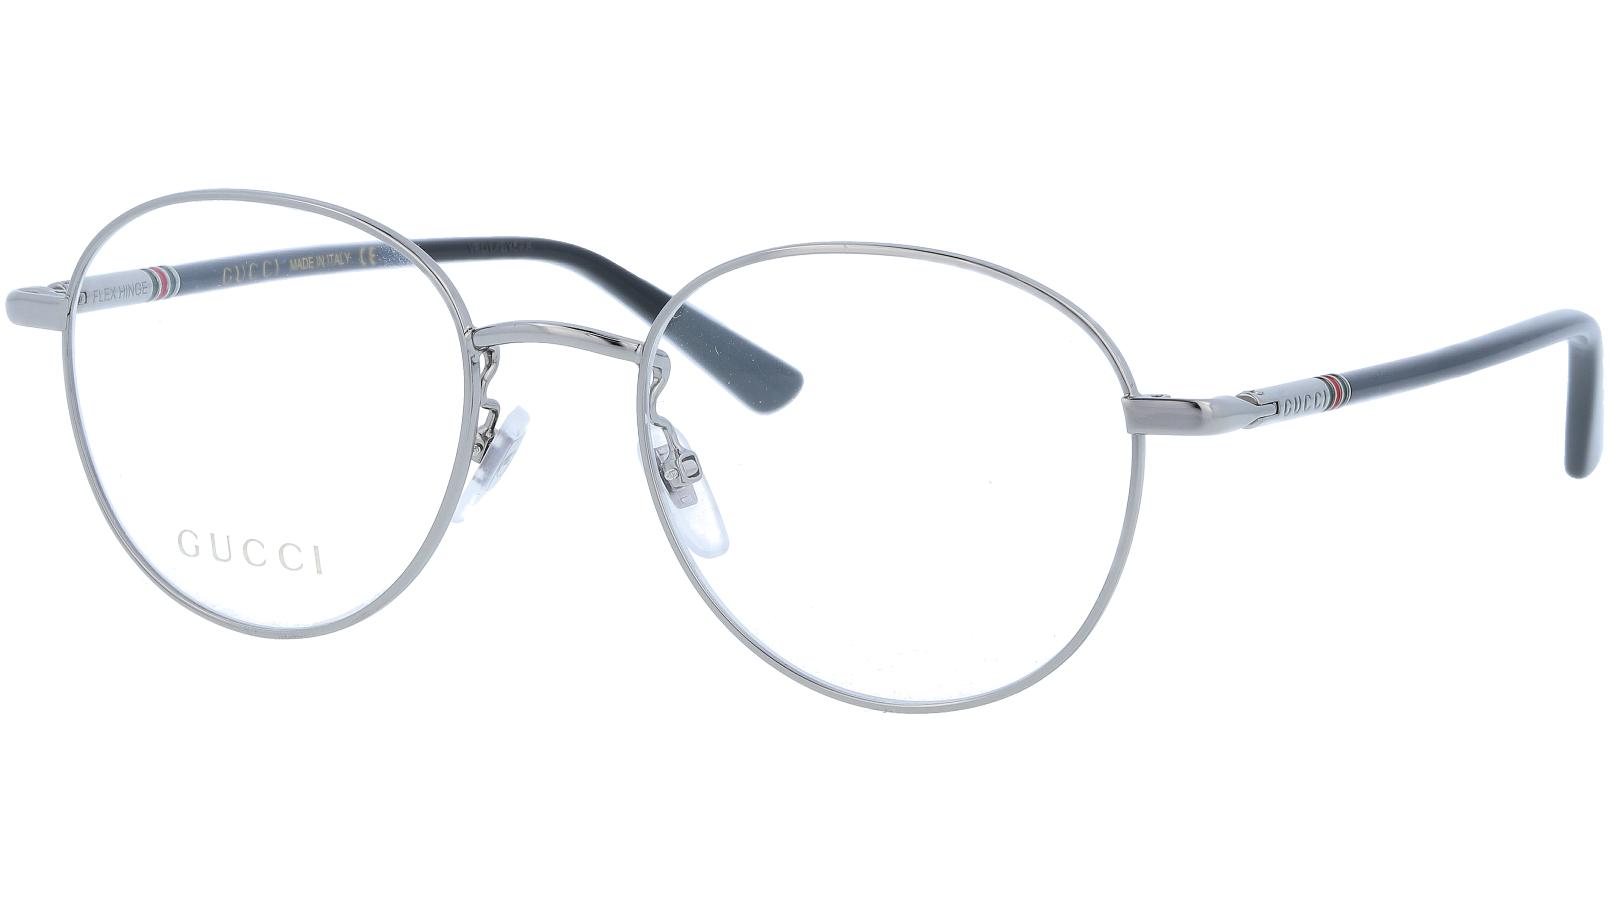 GUCCI GG0392O 001 51 RUTHENIUM Glasses